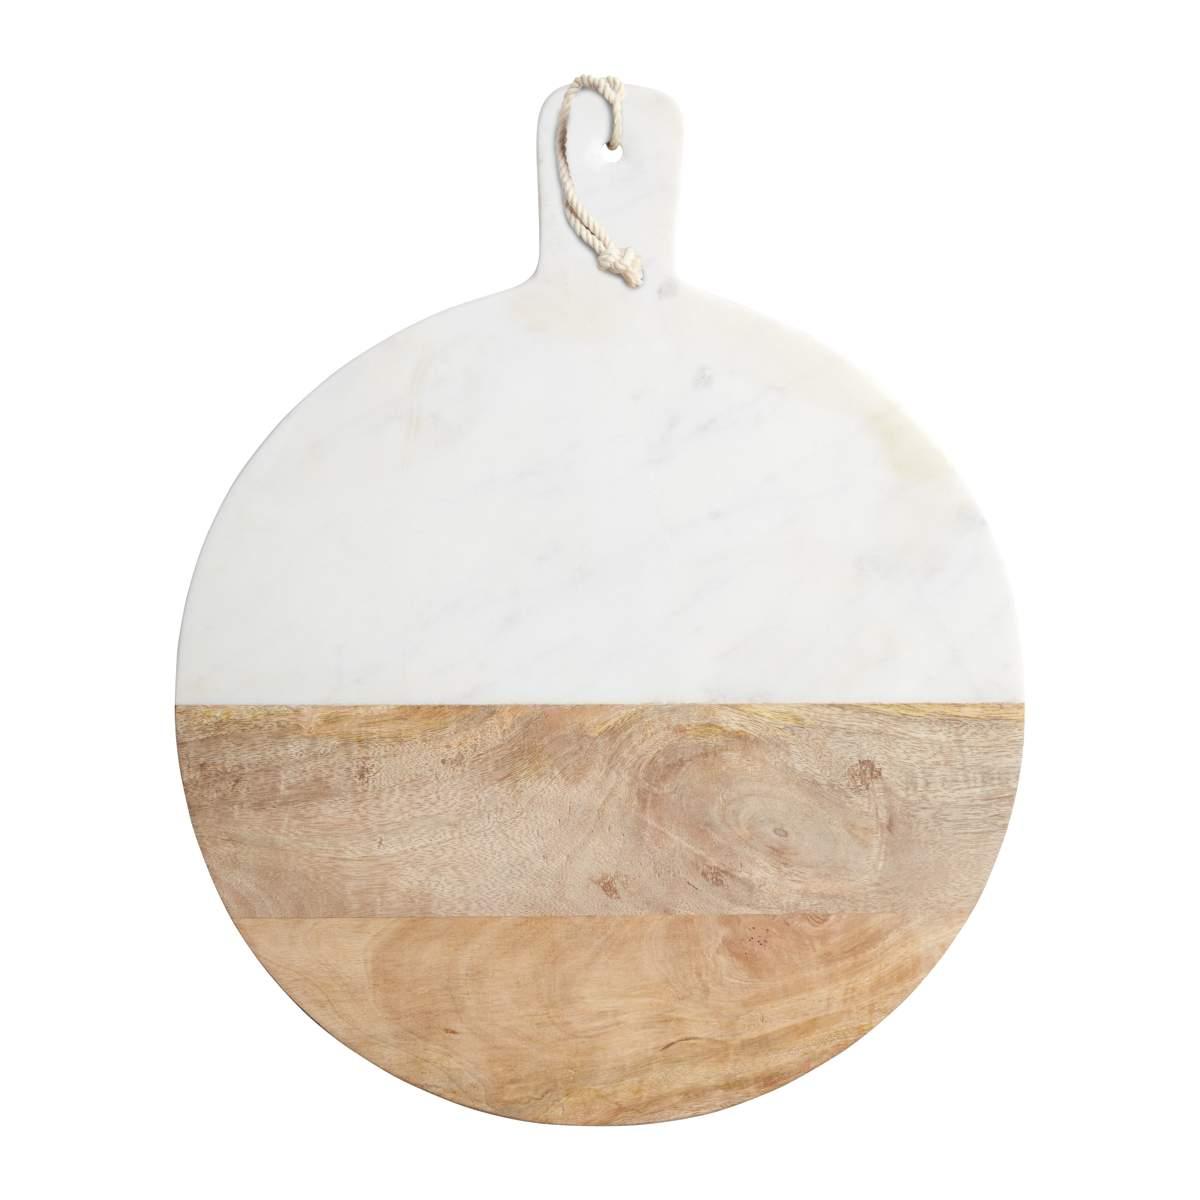 Kitchen Craft round paddle board, £67